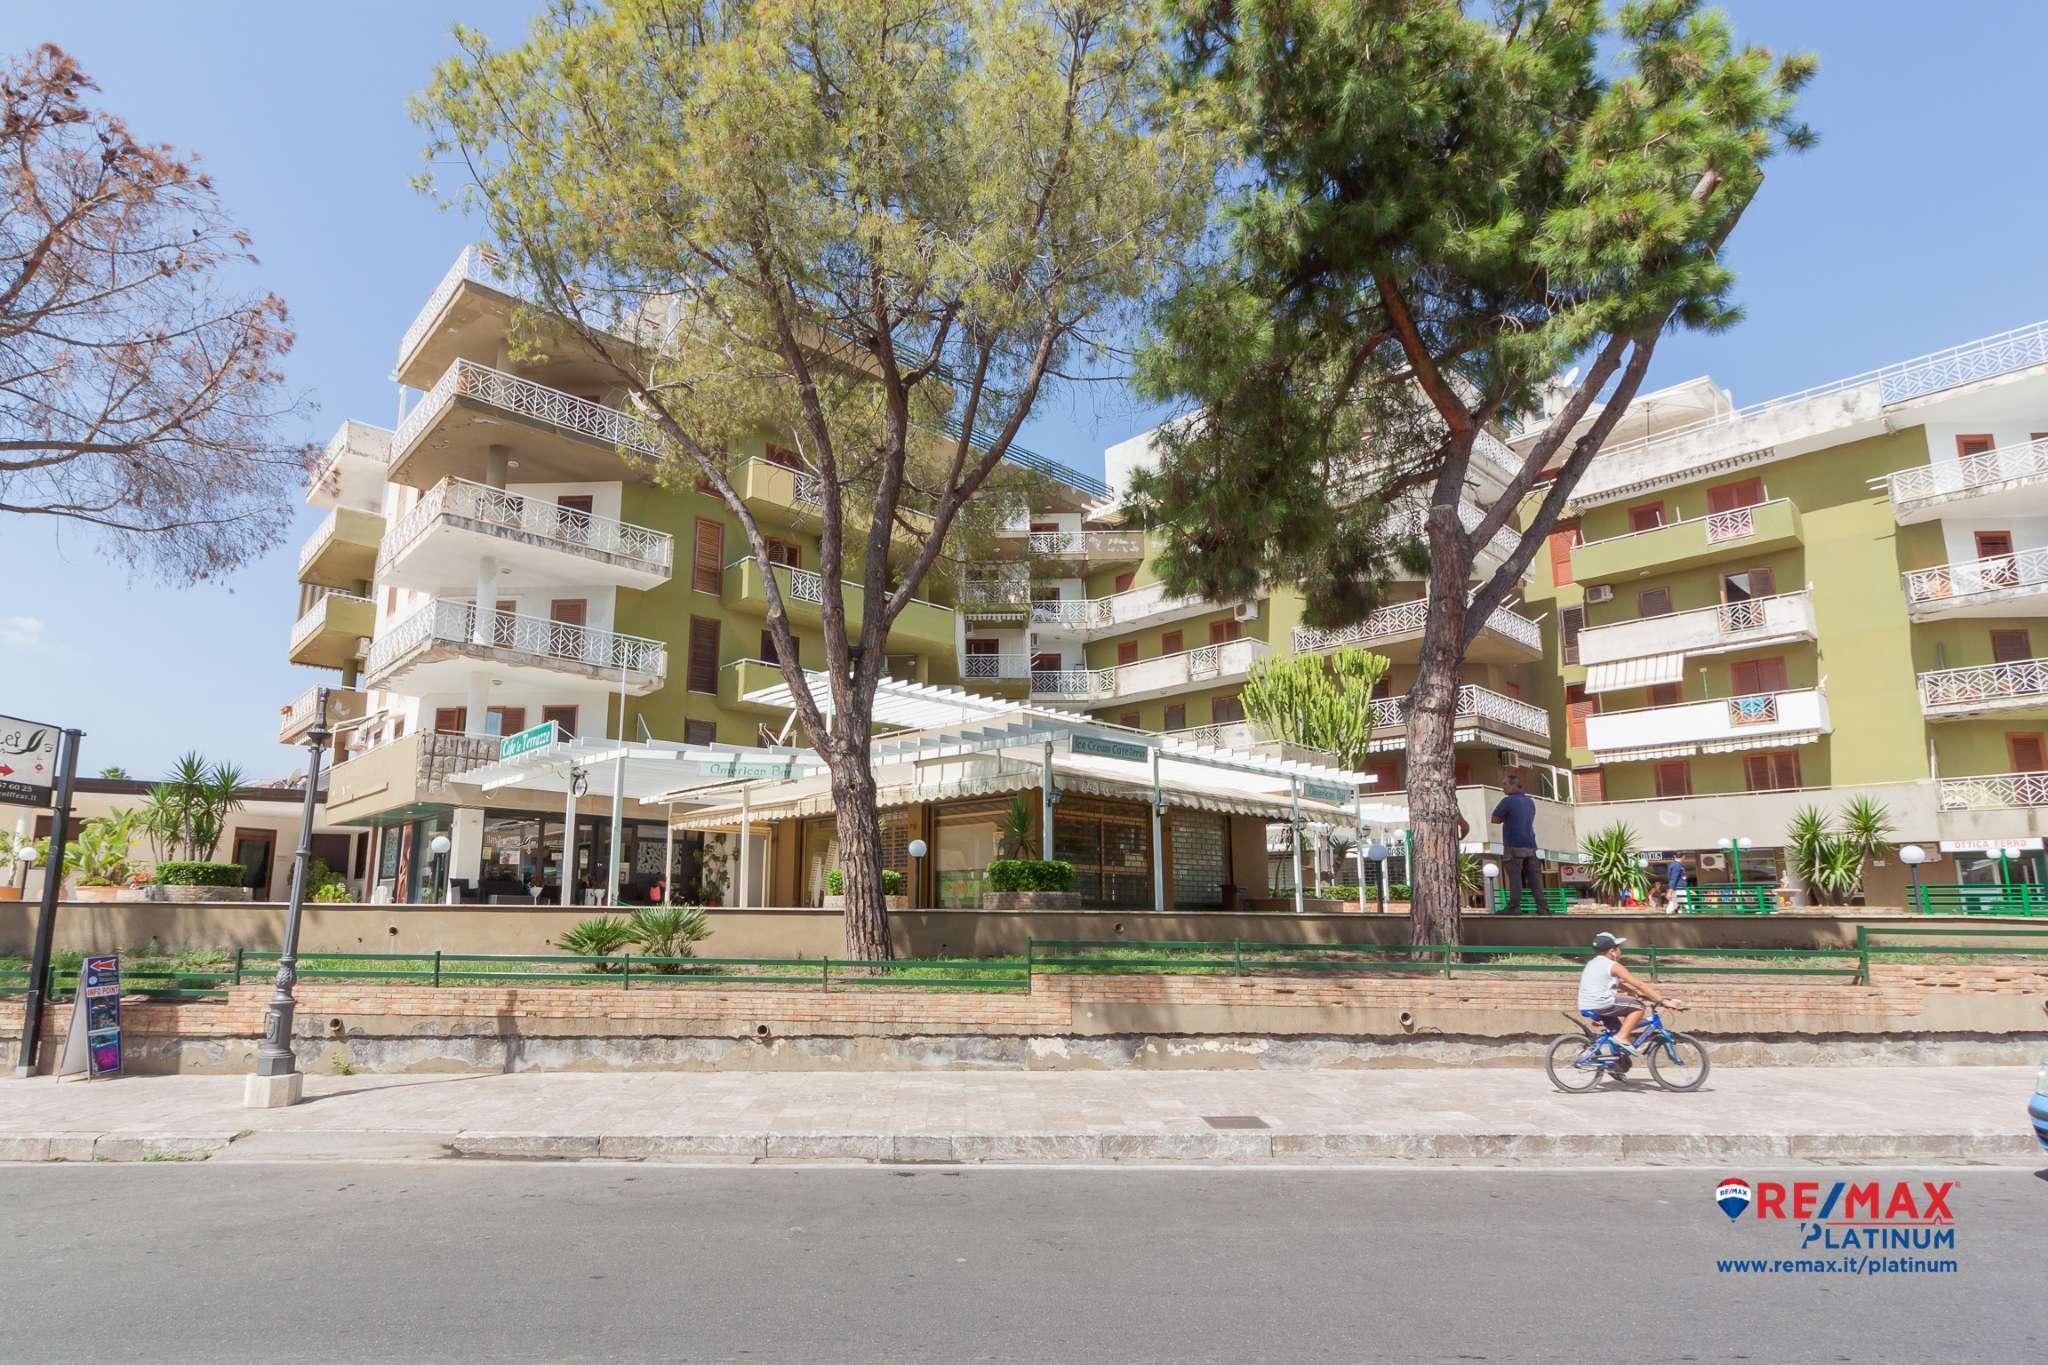 Cafe Le Terrazze Giardini Naxos